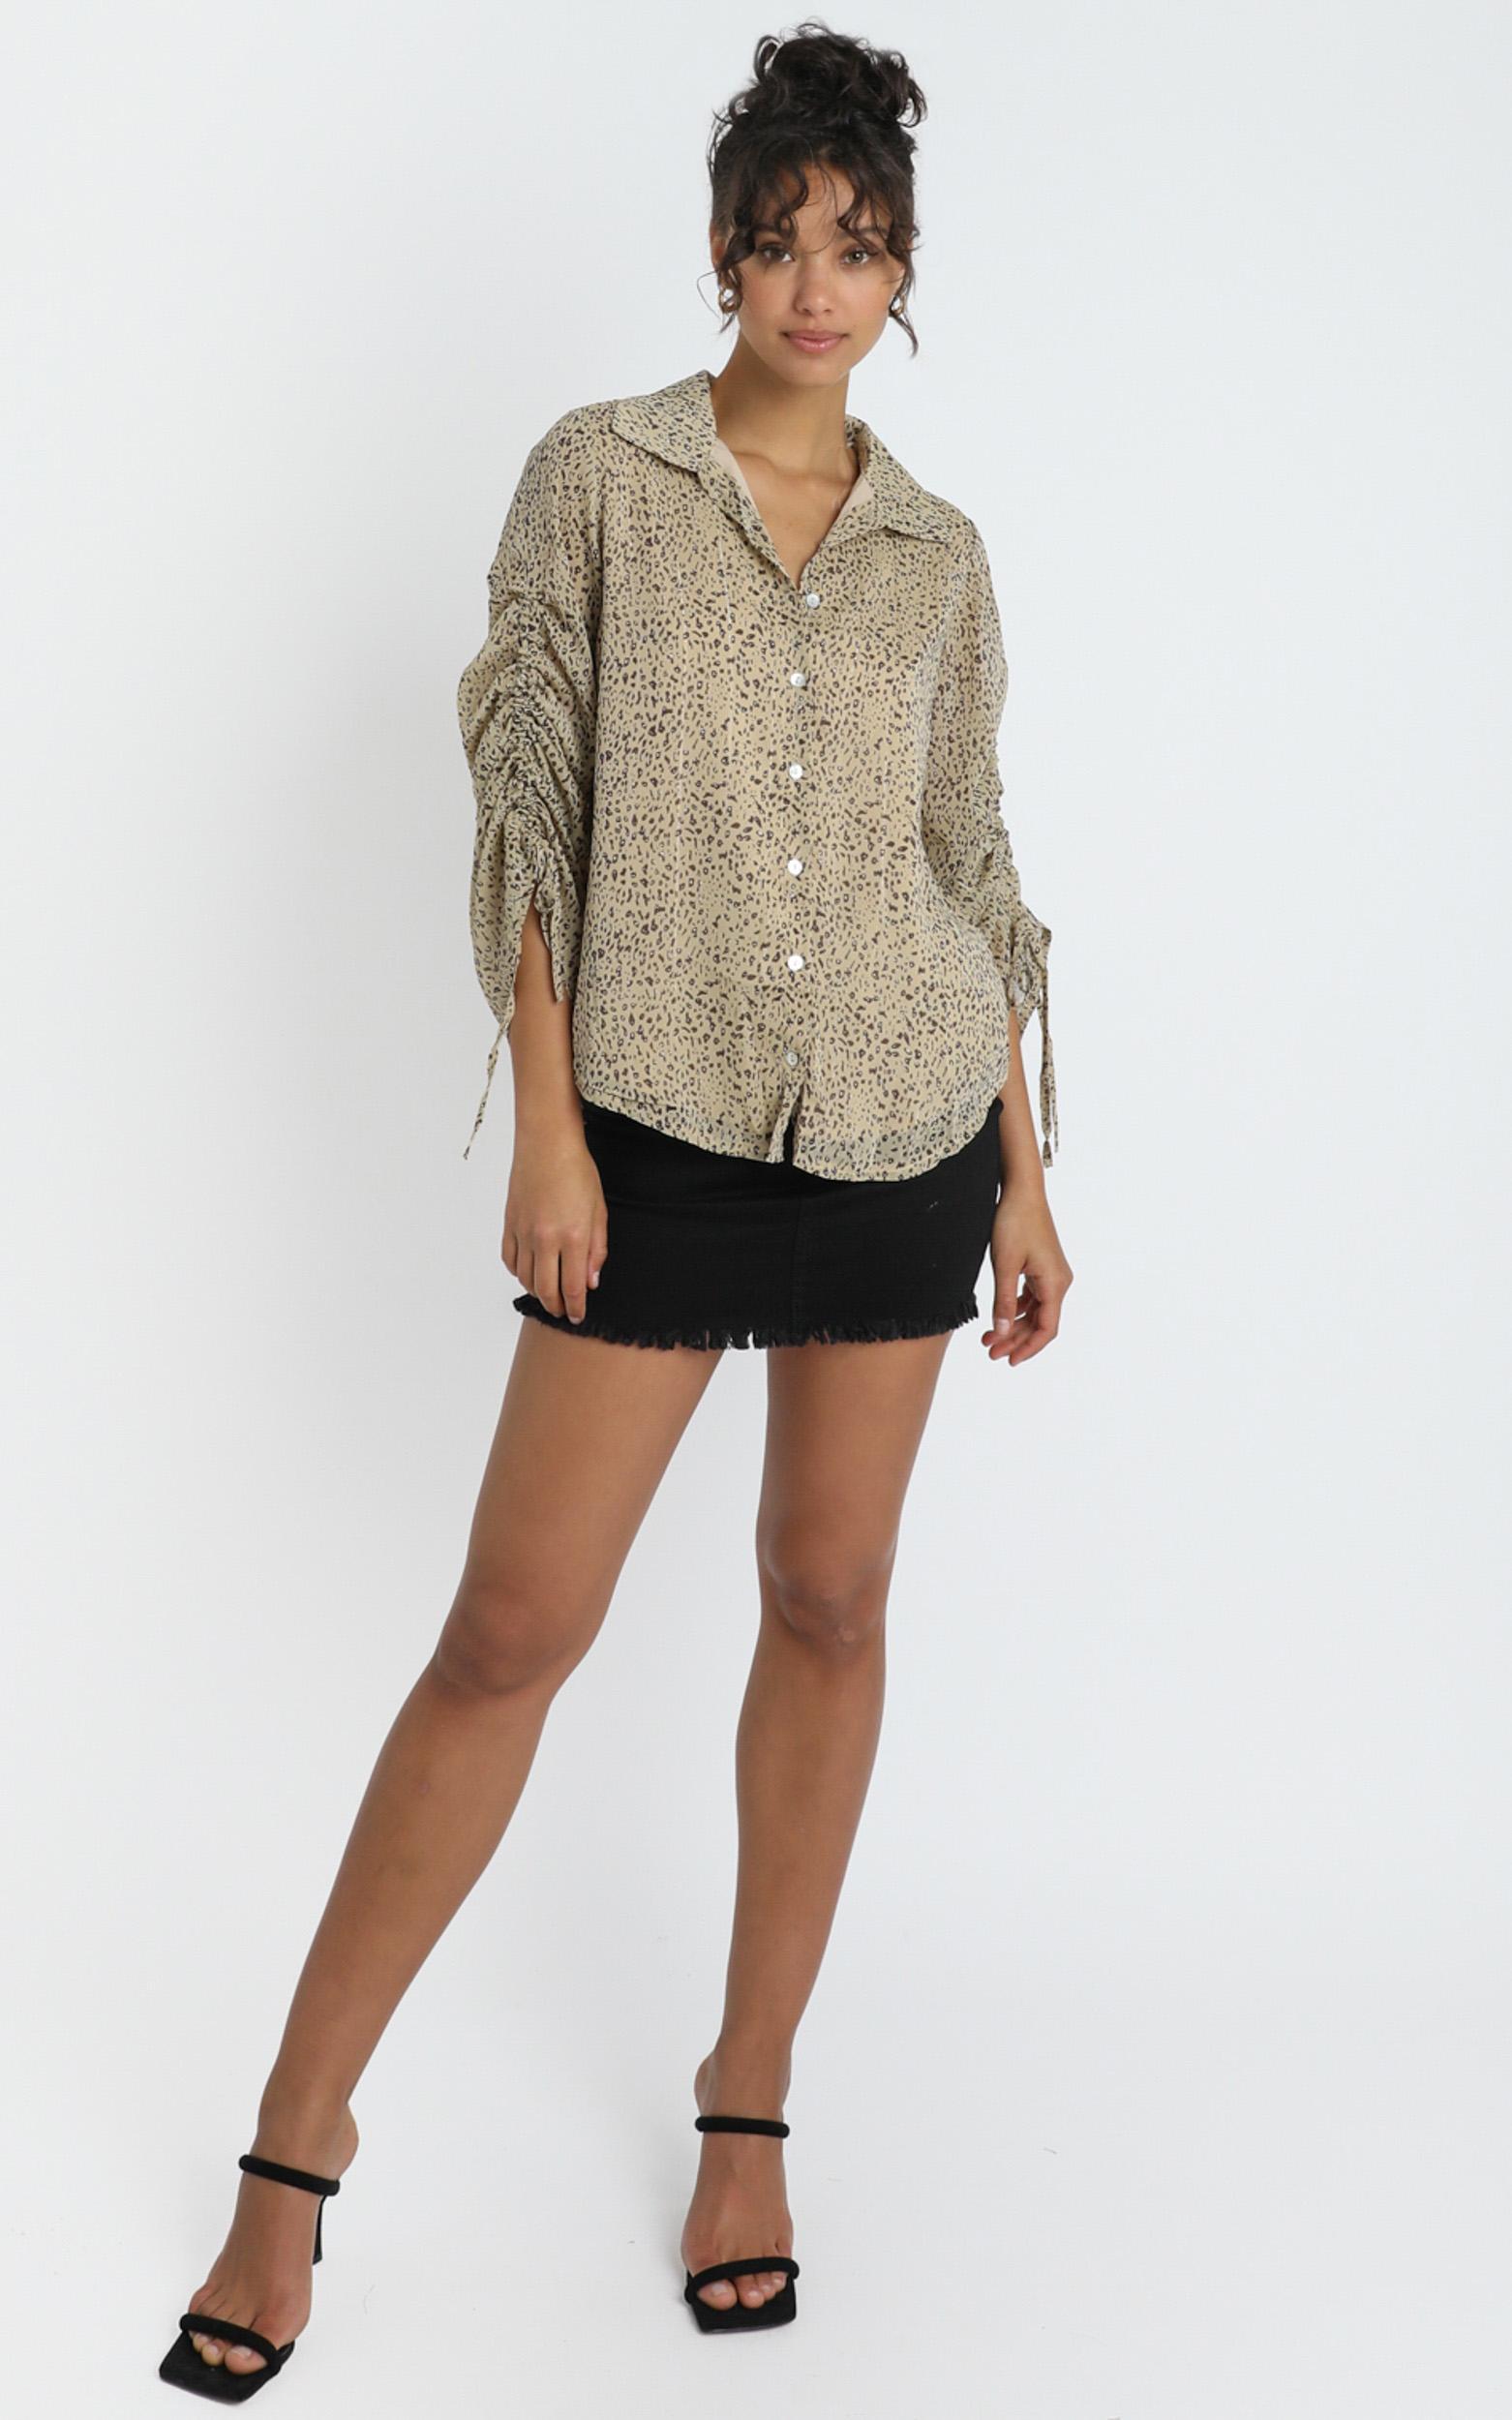 California Numb denim skirt in black - 14 (XL), Black, hi-res image number null